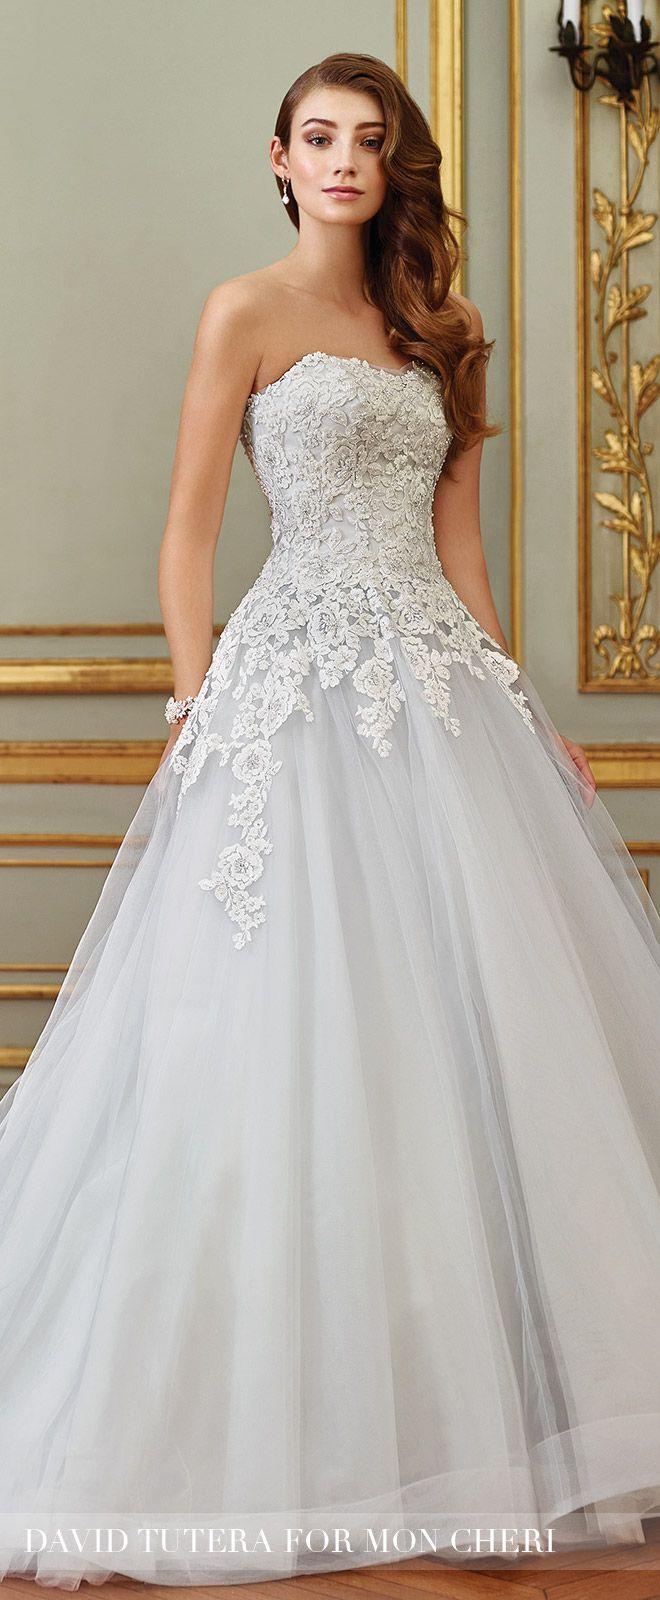 Wedding Dress by David Tutera 2017 Bridal Collection | Style No. » 117270 Sonia